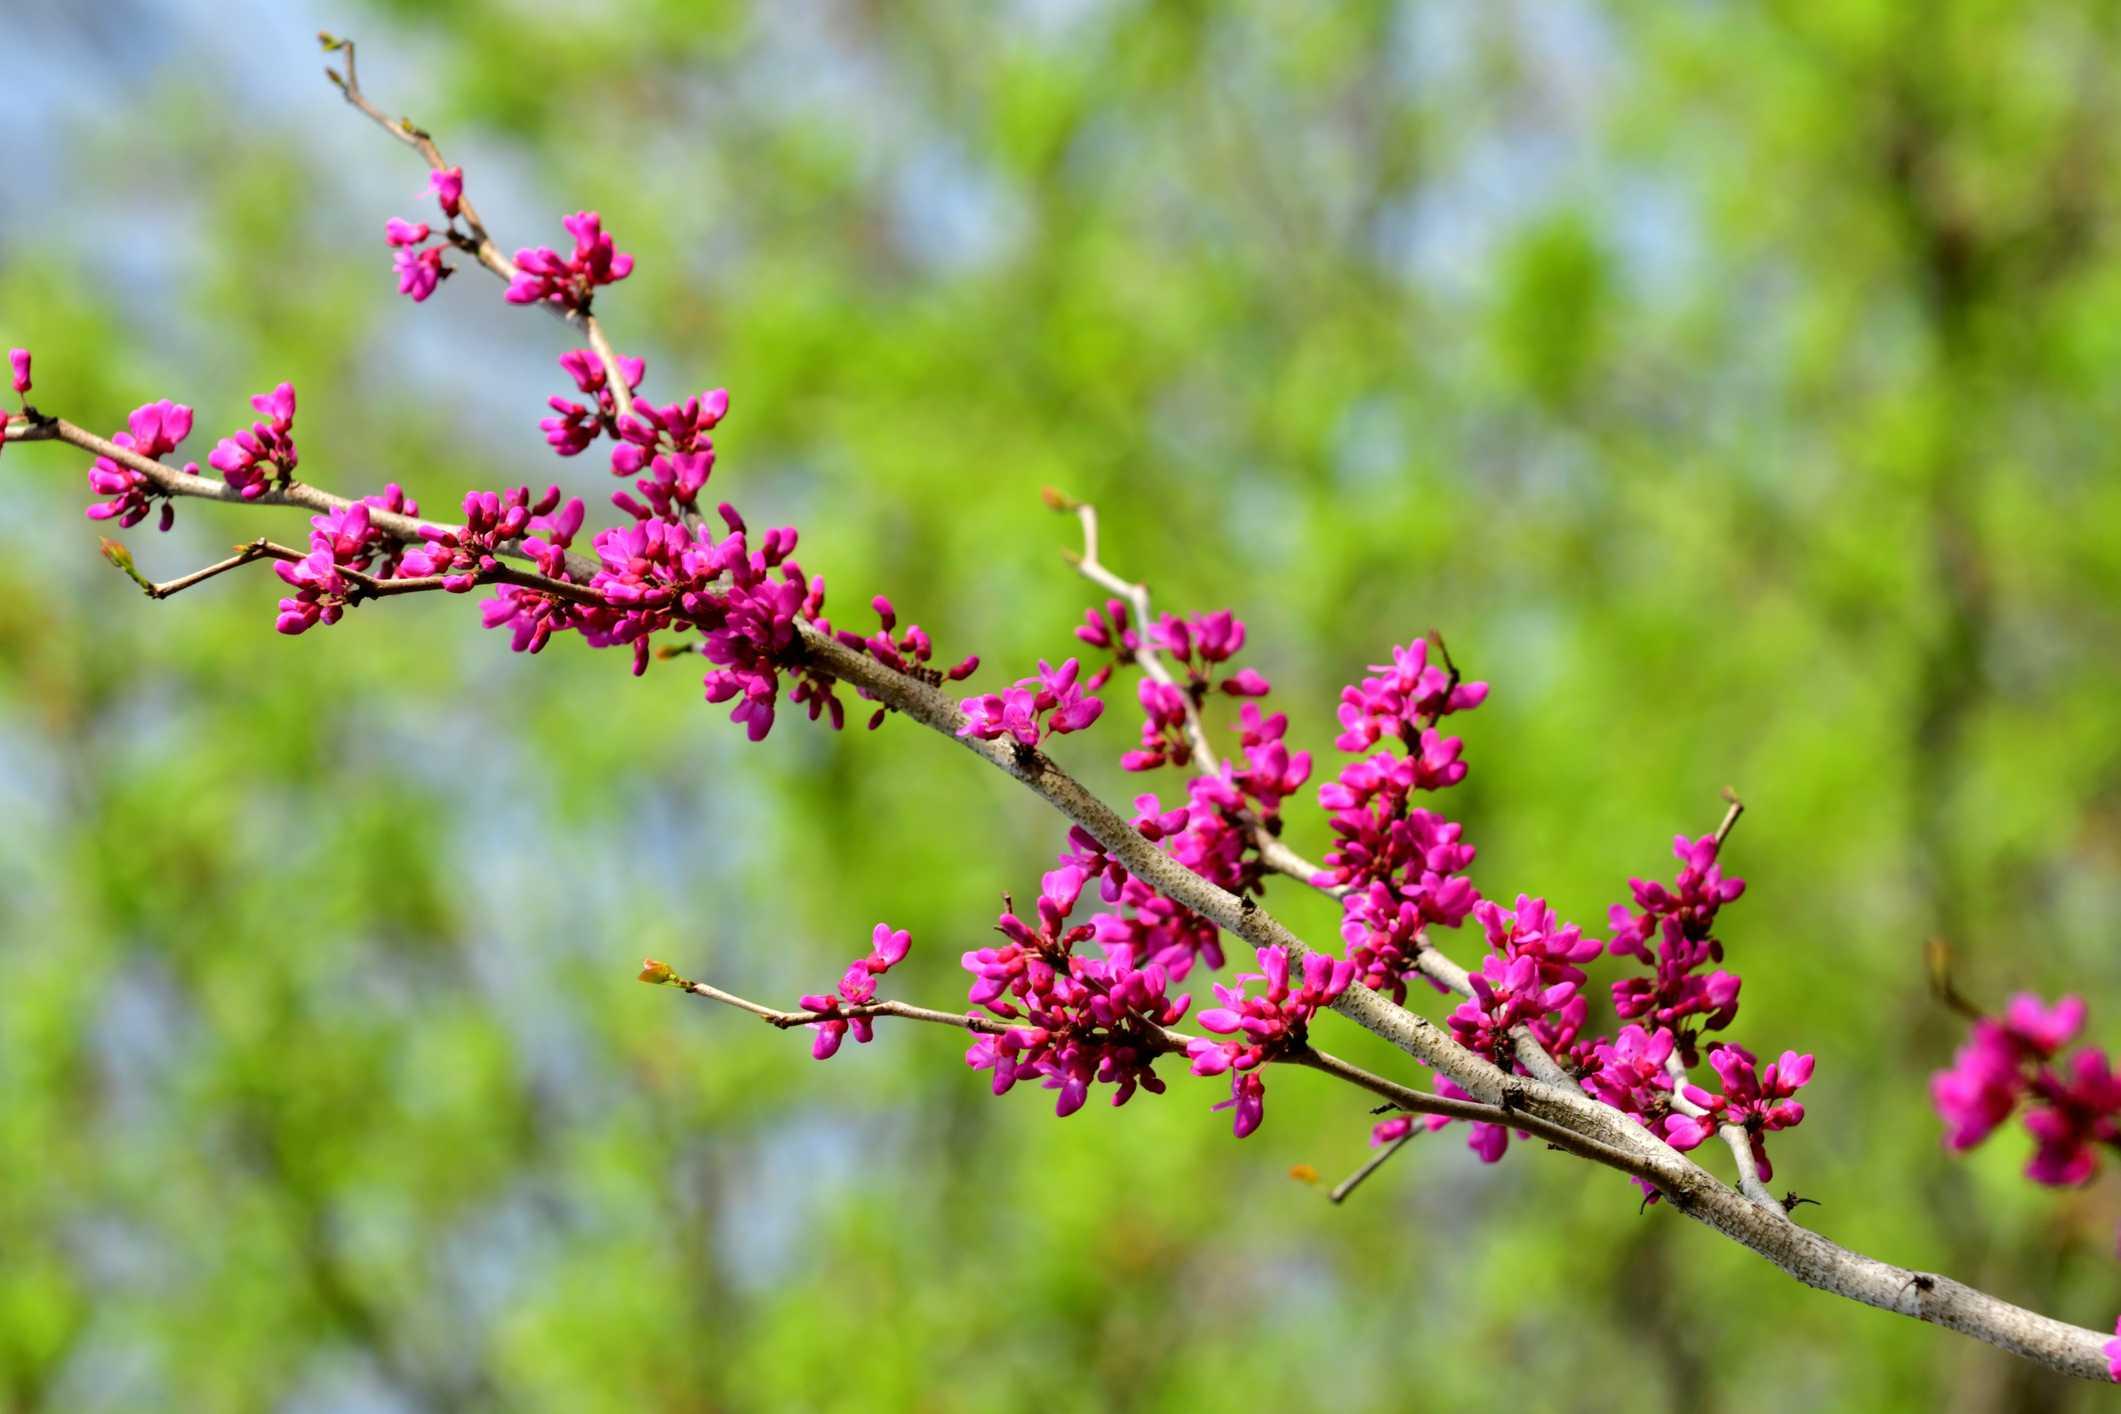 Rama de un árbol de redbud en flor